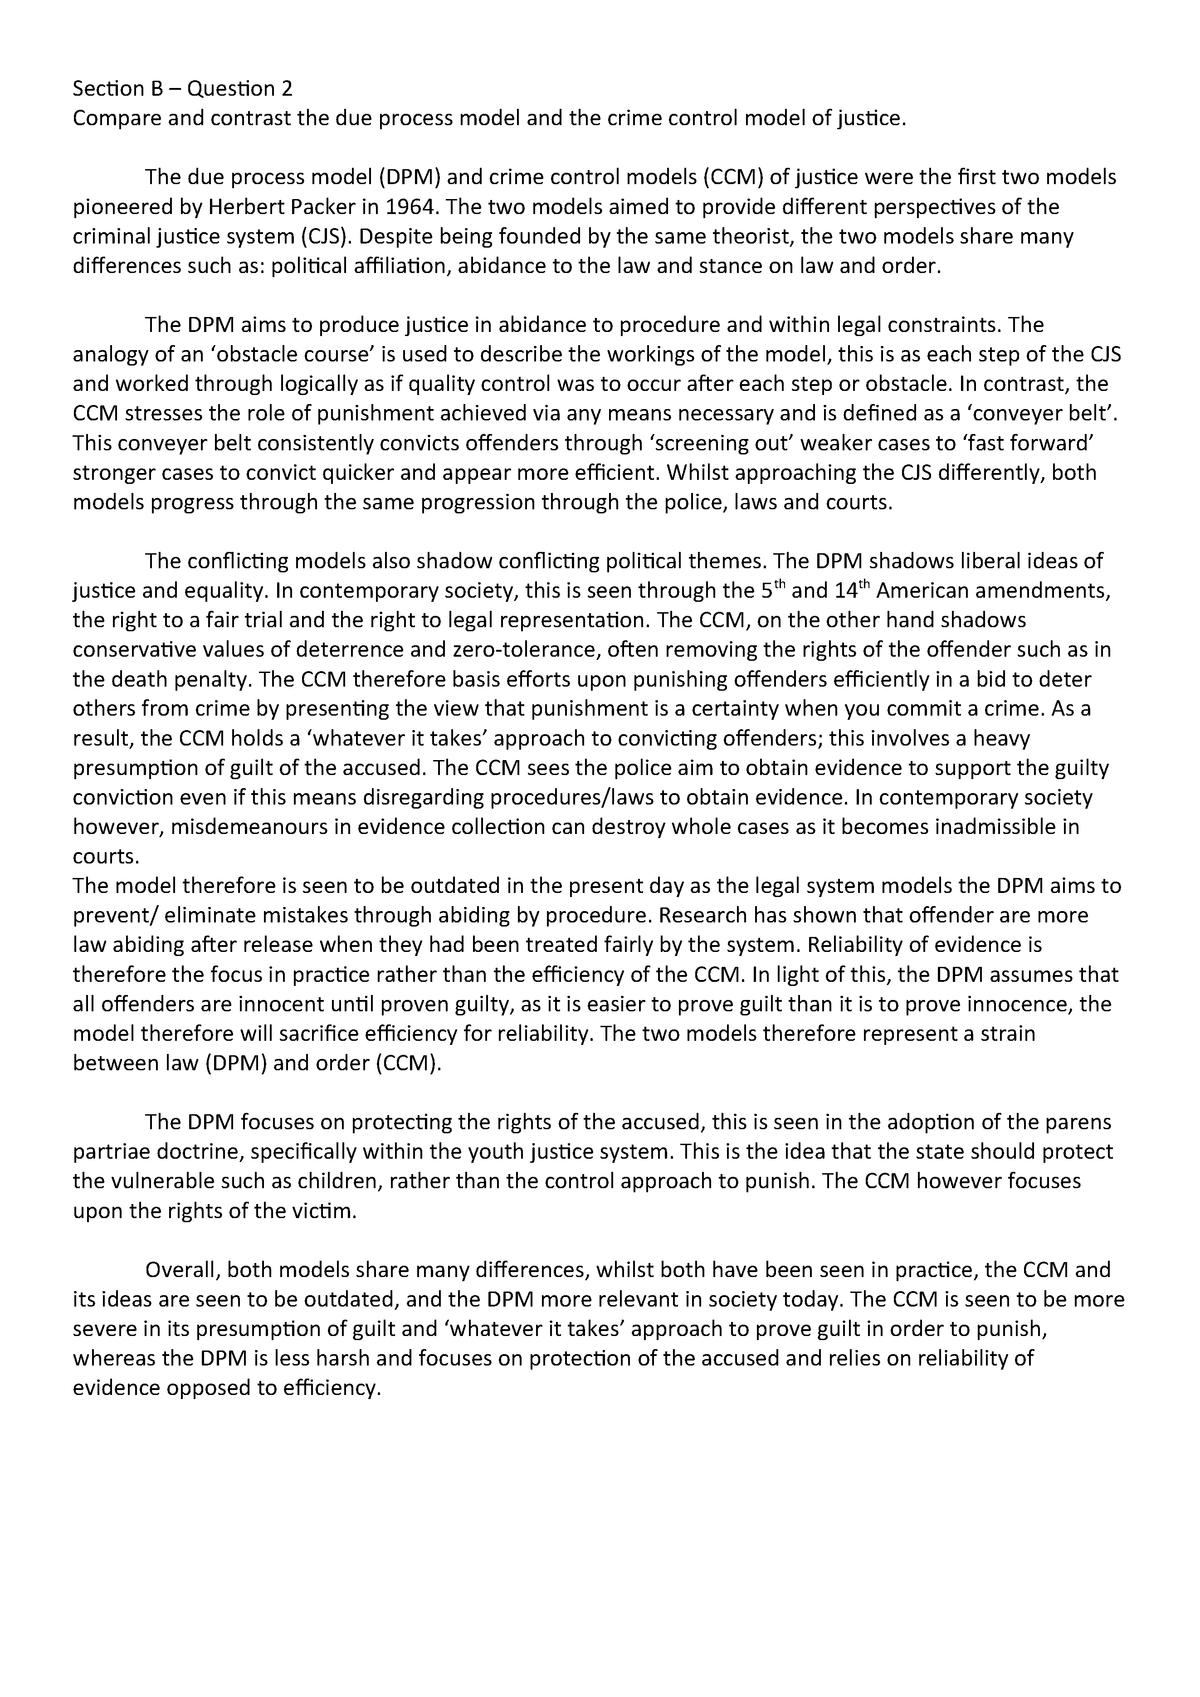 Argument essay rubric grading